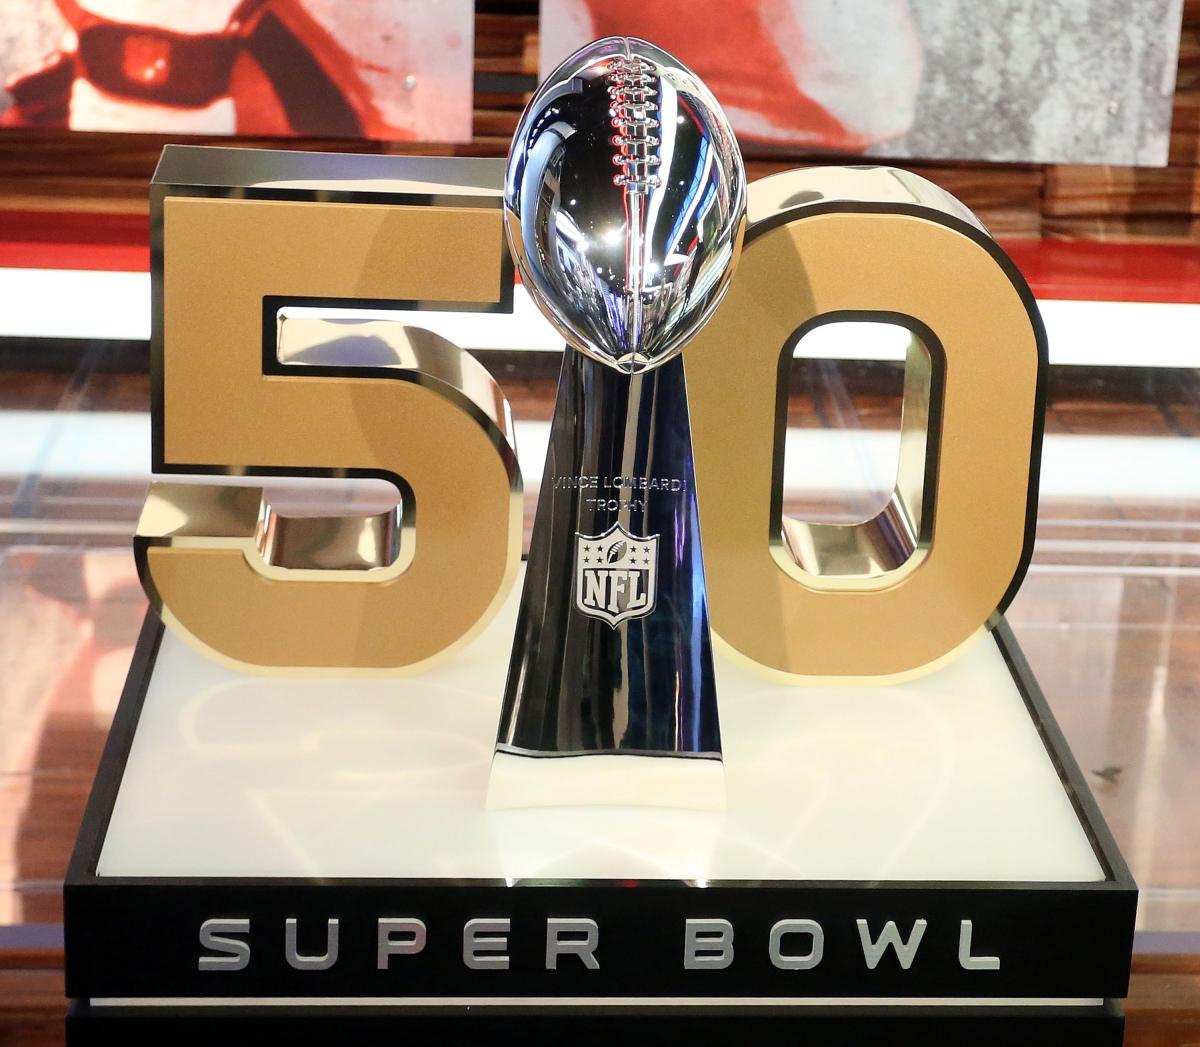 super bowl 50 betting nfl games online live